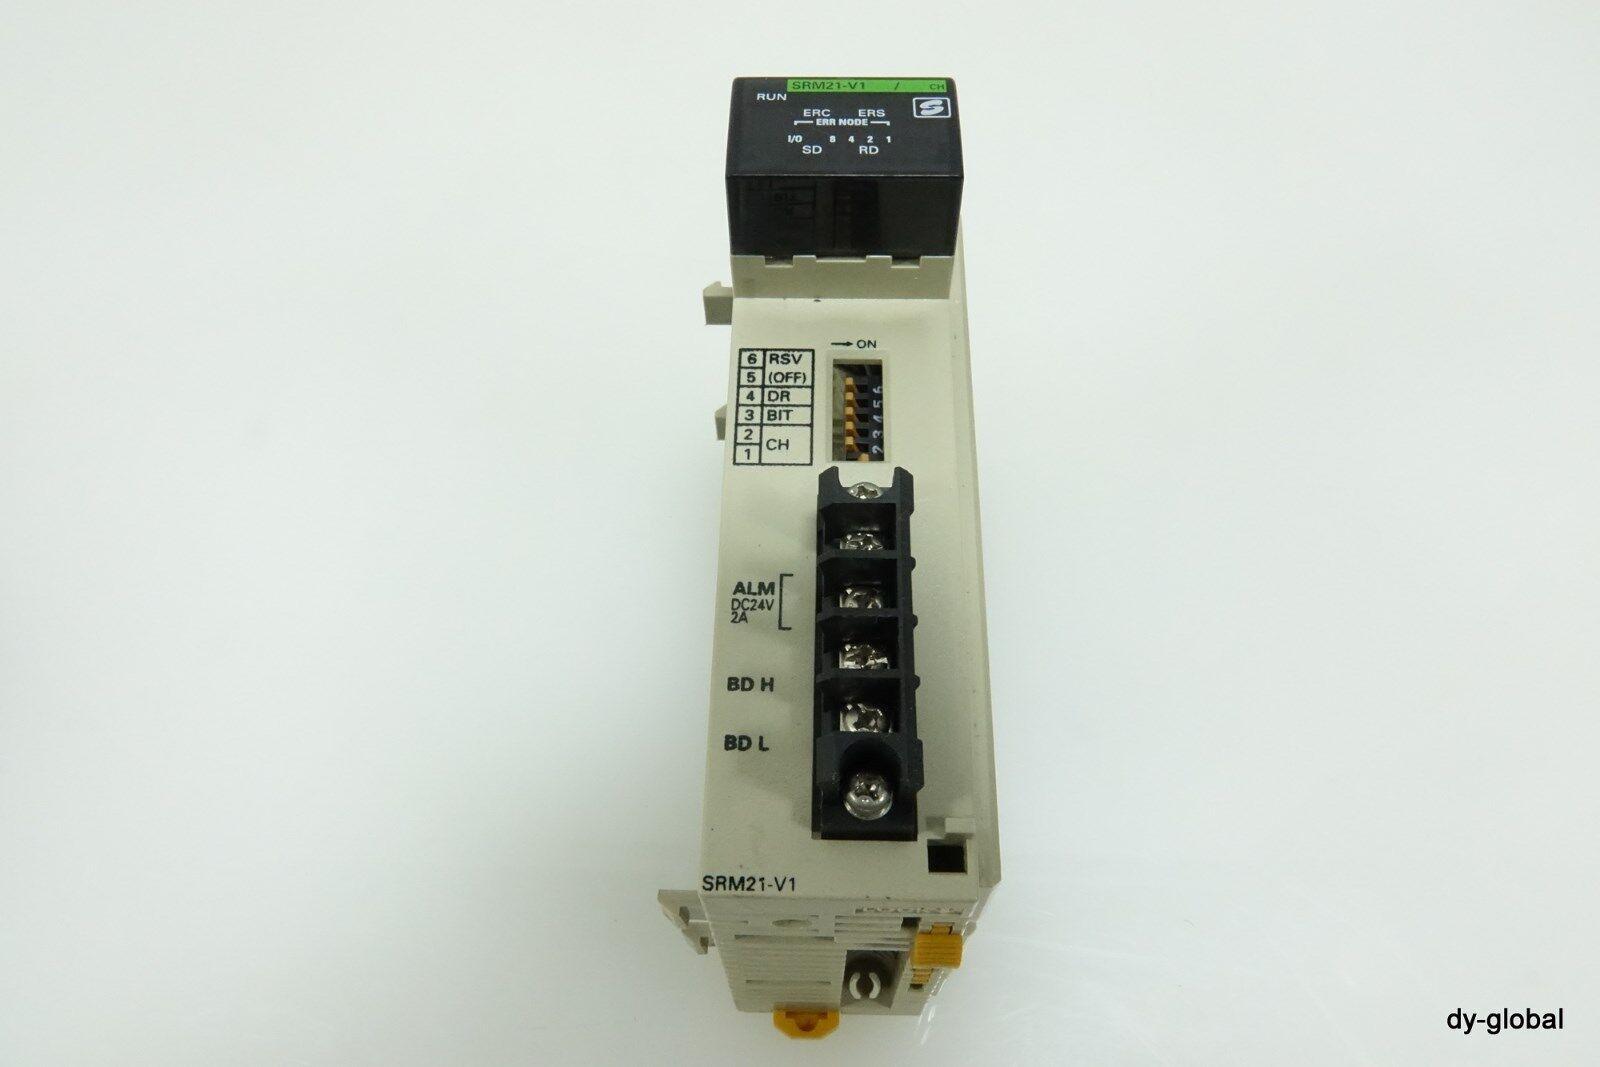 OMRON Used CQM1-SRM21-V1 COMPOBUS S MASTER UNIT Cover Missing PLC-I-445=2I27